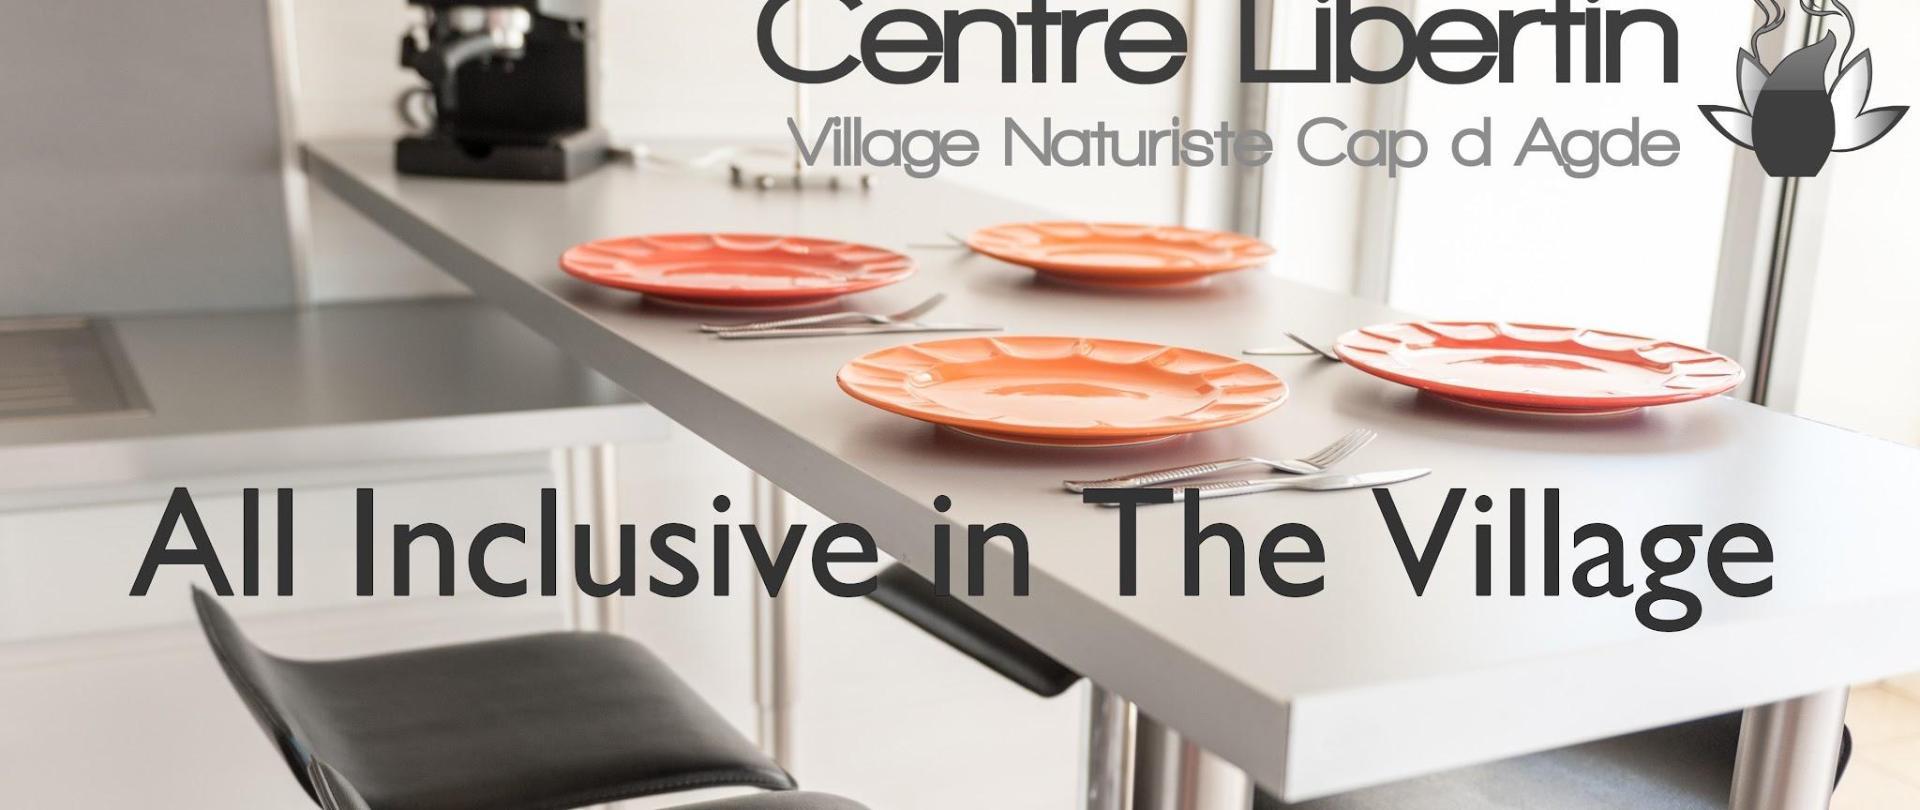 Centre Libertin au Cap d Agde  All Inclusive in The Village.jpg